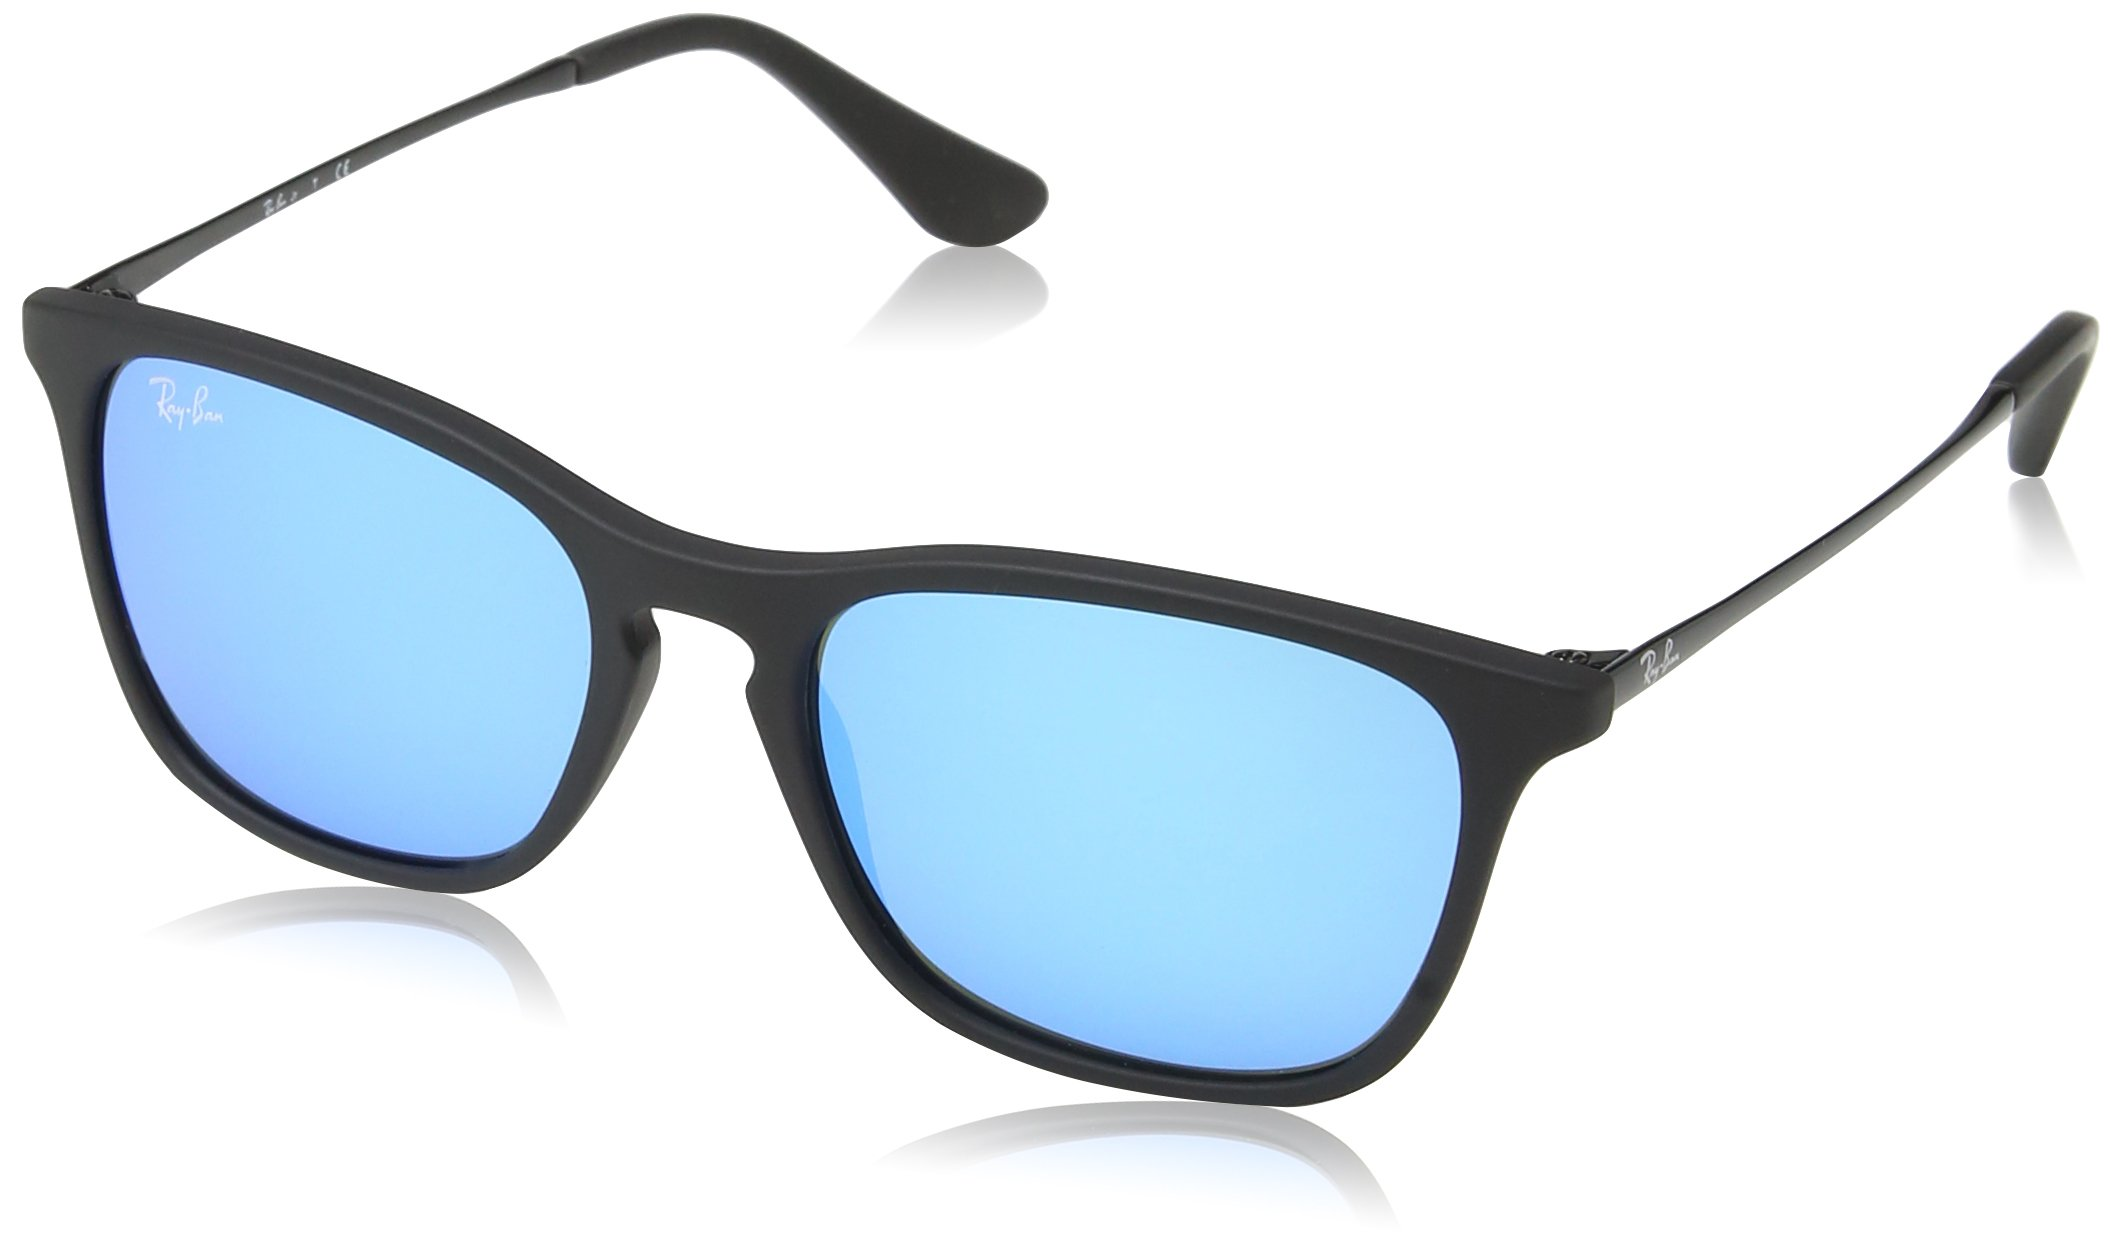 RAY-BAN JUNIOR Kids' RJ9061S Chris Kids Rectangular Sunglasses, Rubber Black/Light Green Mirror Blue, 49 mm by RAY-BAN JUNIOR